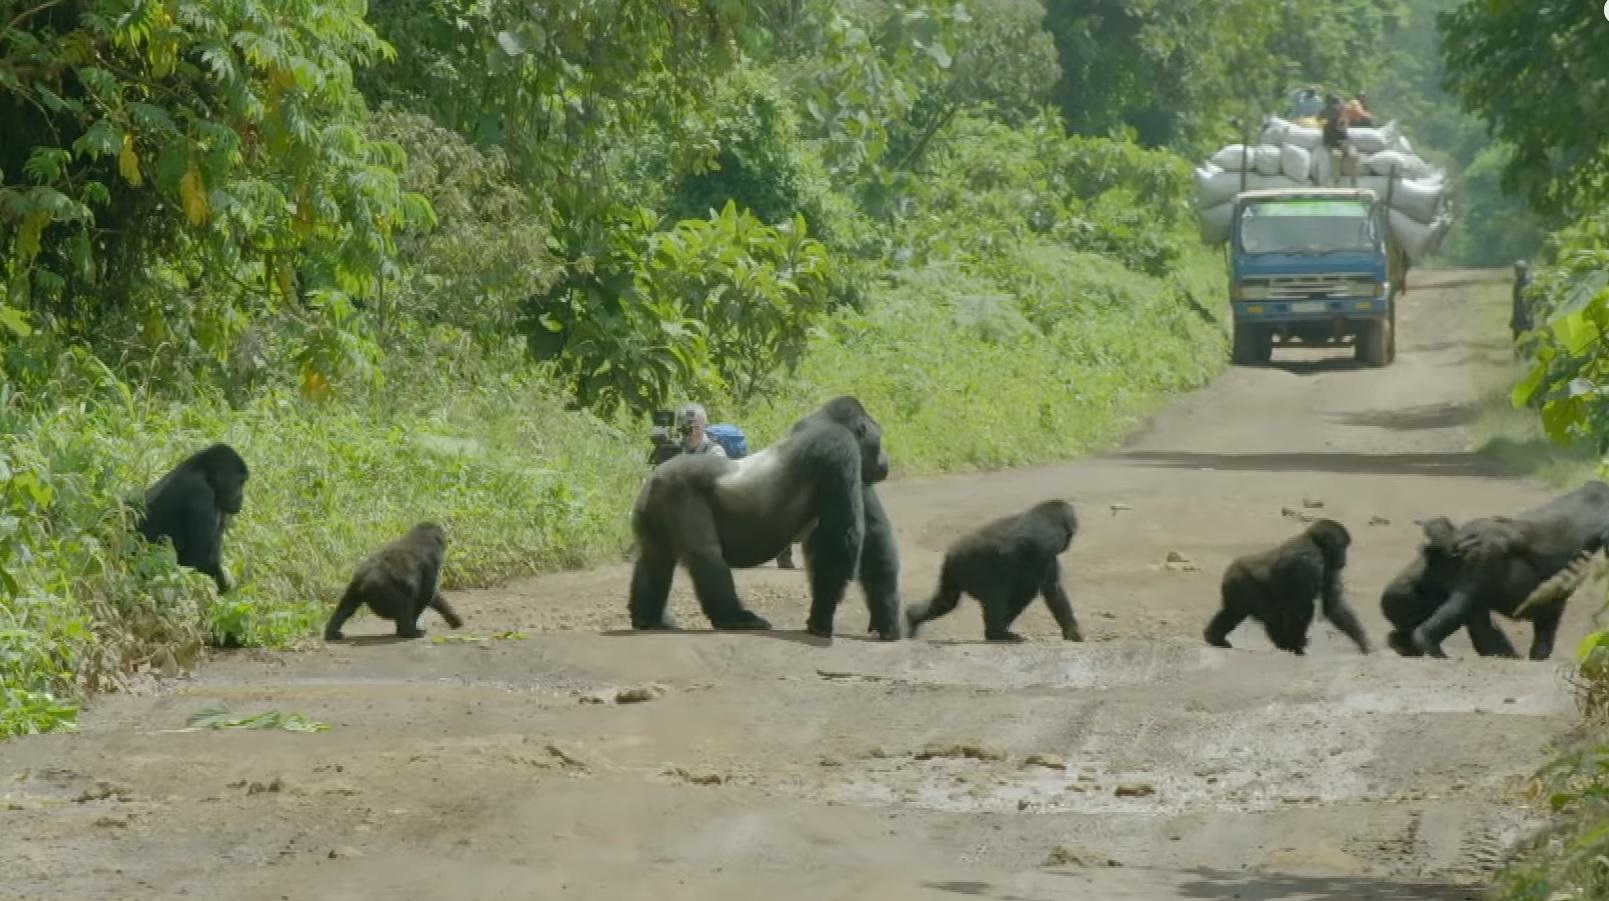 Gorilla Family Crossing The Road